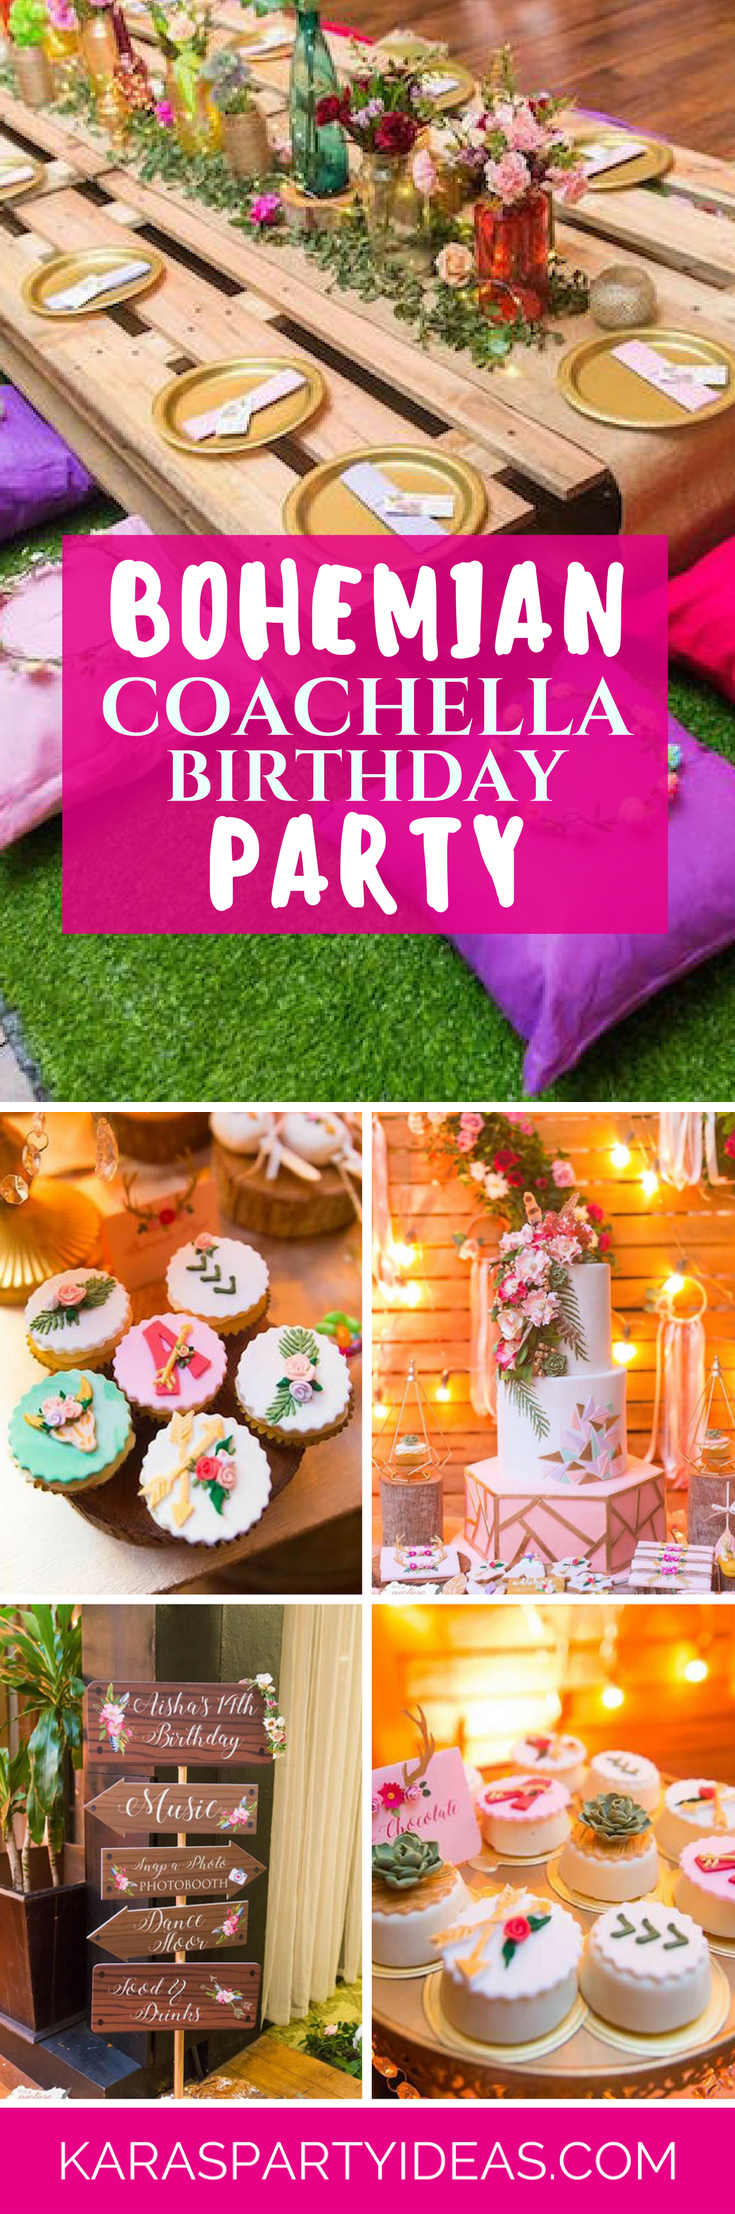 Bohemian Coachella Birthday Party via Kara's Party Ideas - KarasPartyIdeas.com